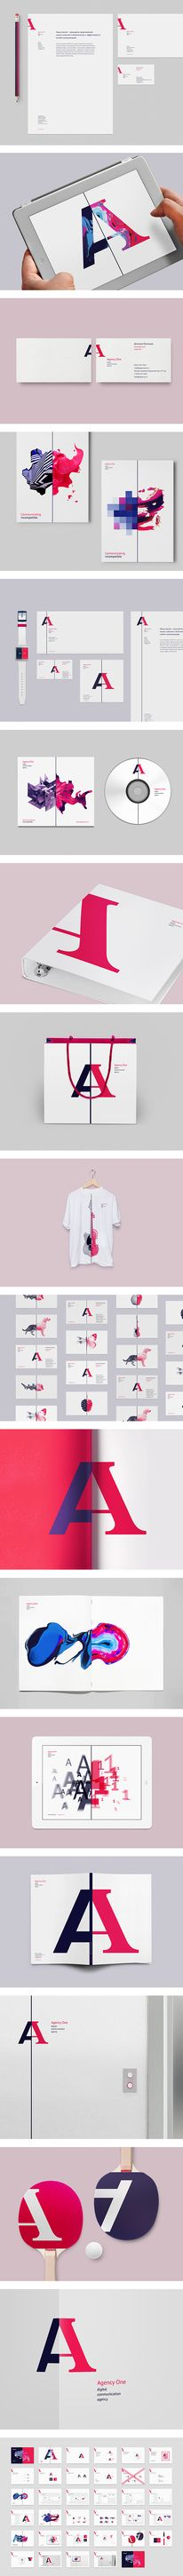 Qapital, Identity — Designspiration